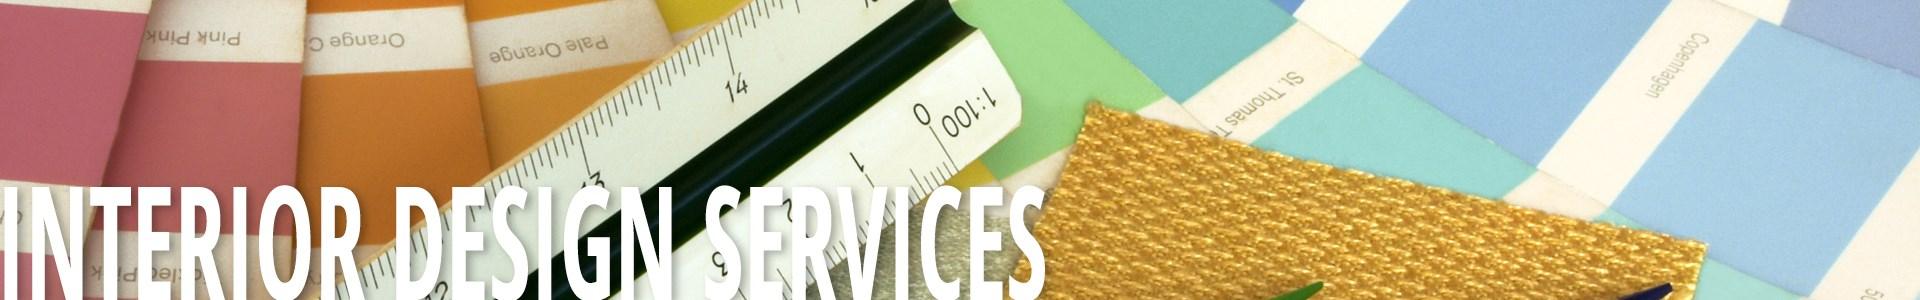 Boulevard Interior Design Services